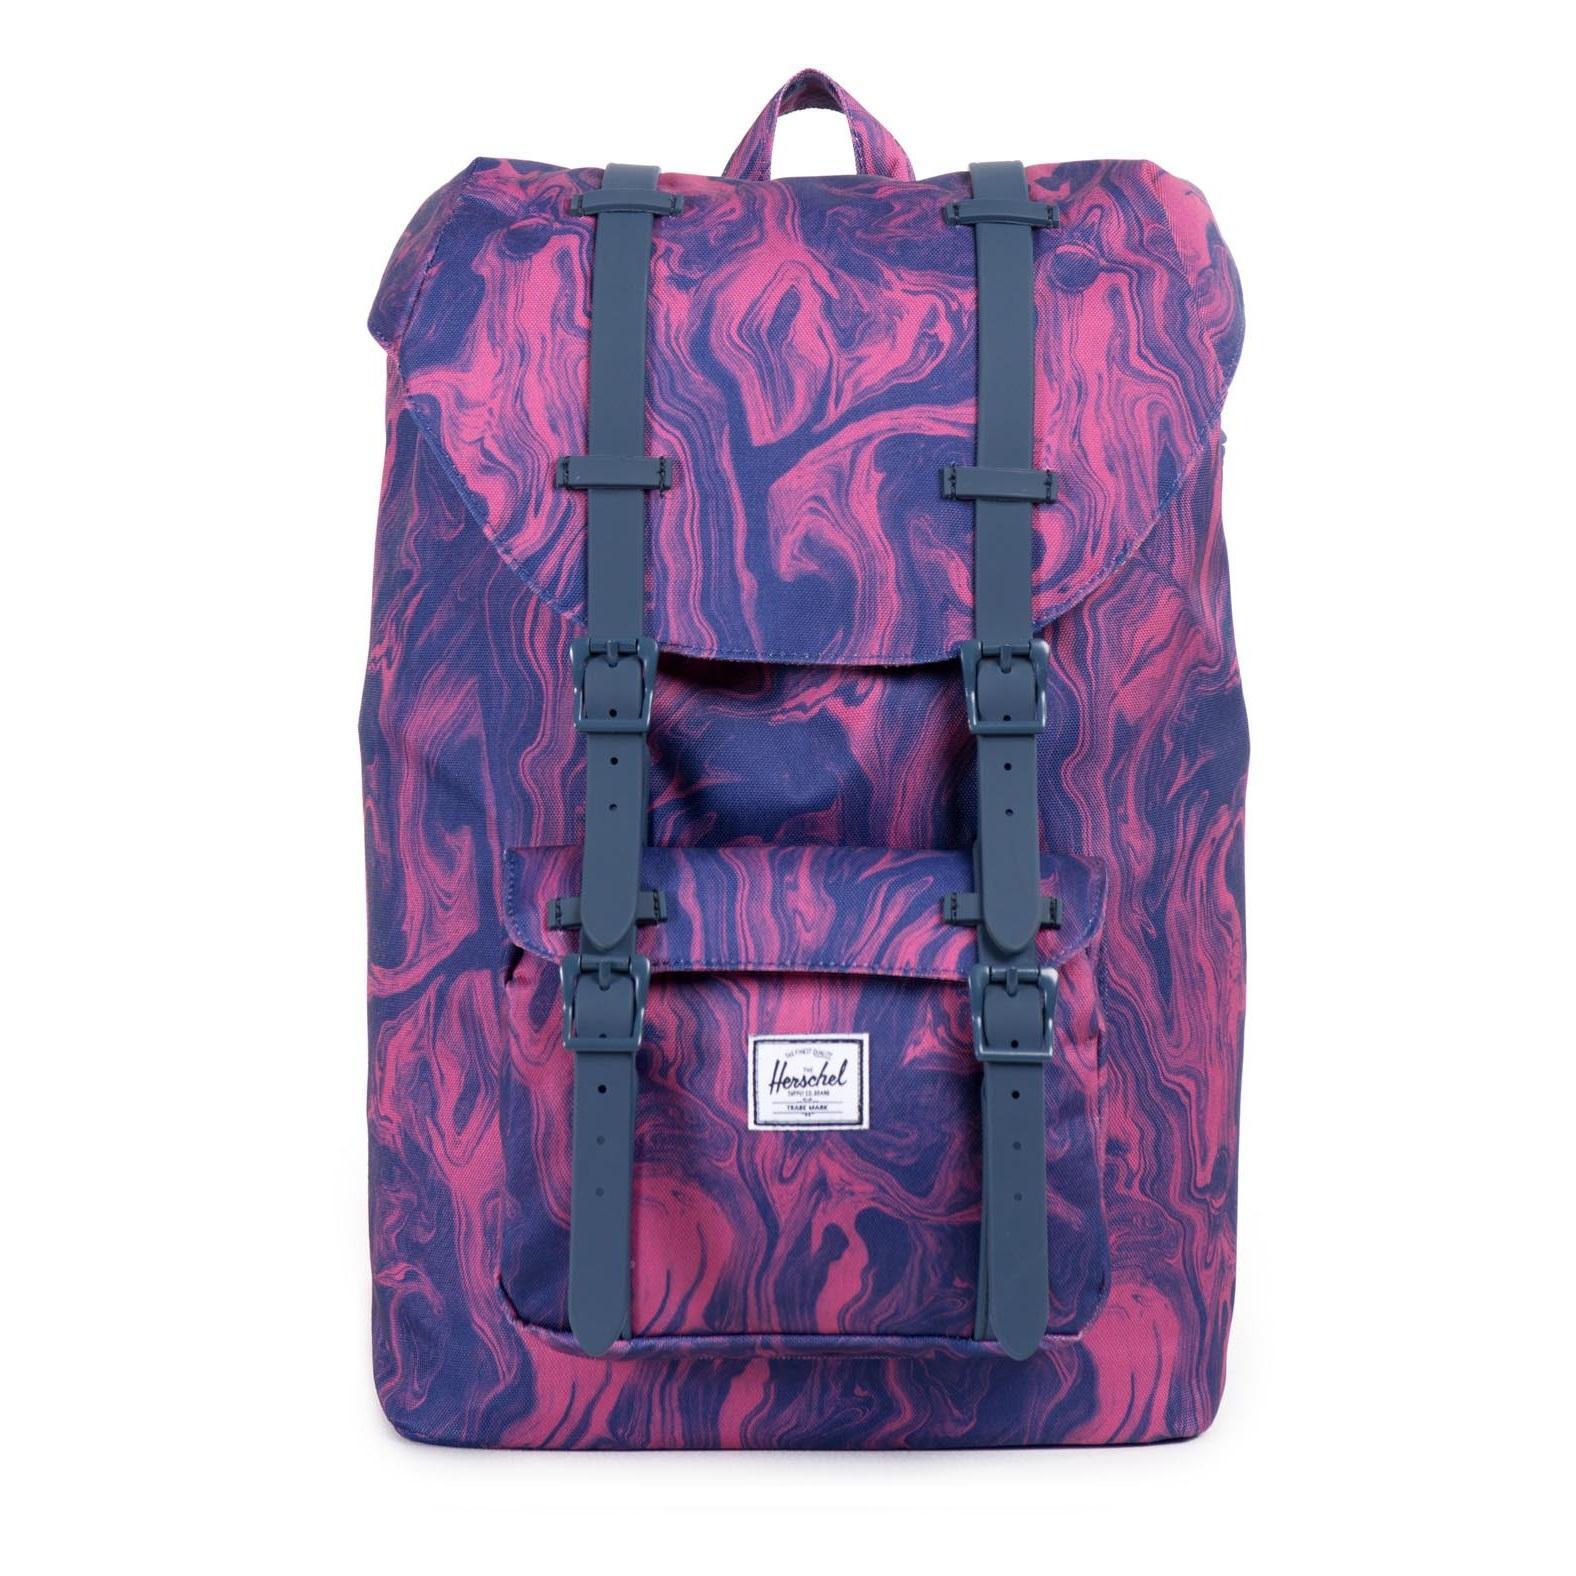 Herschel Little America Backpack Classic Size Full Volume 25L